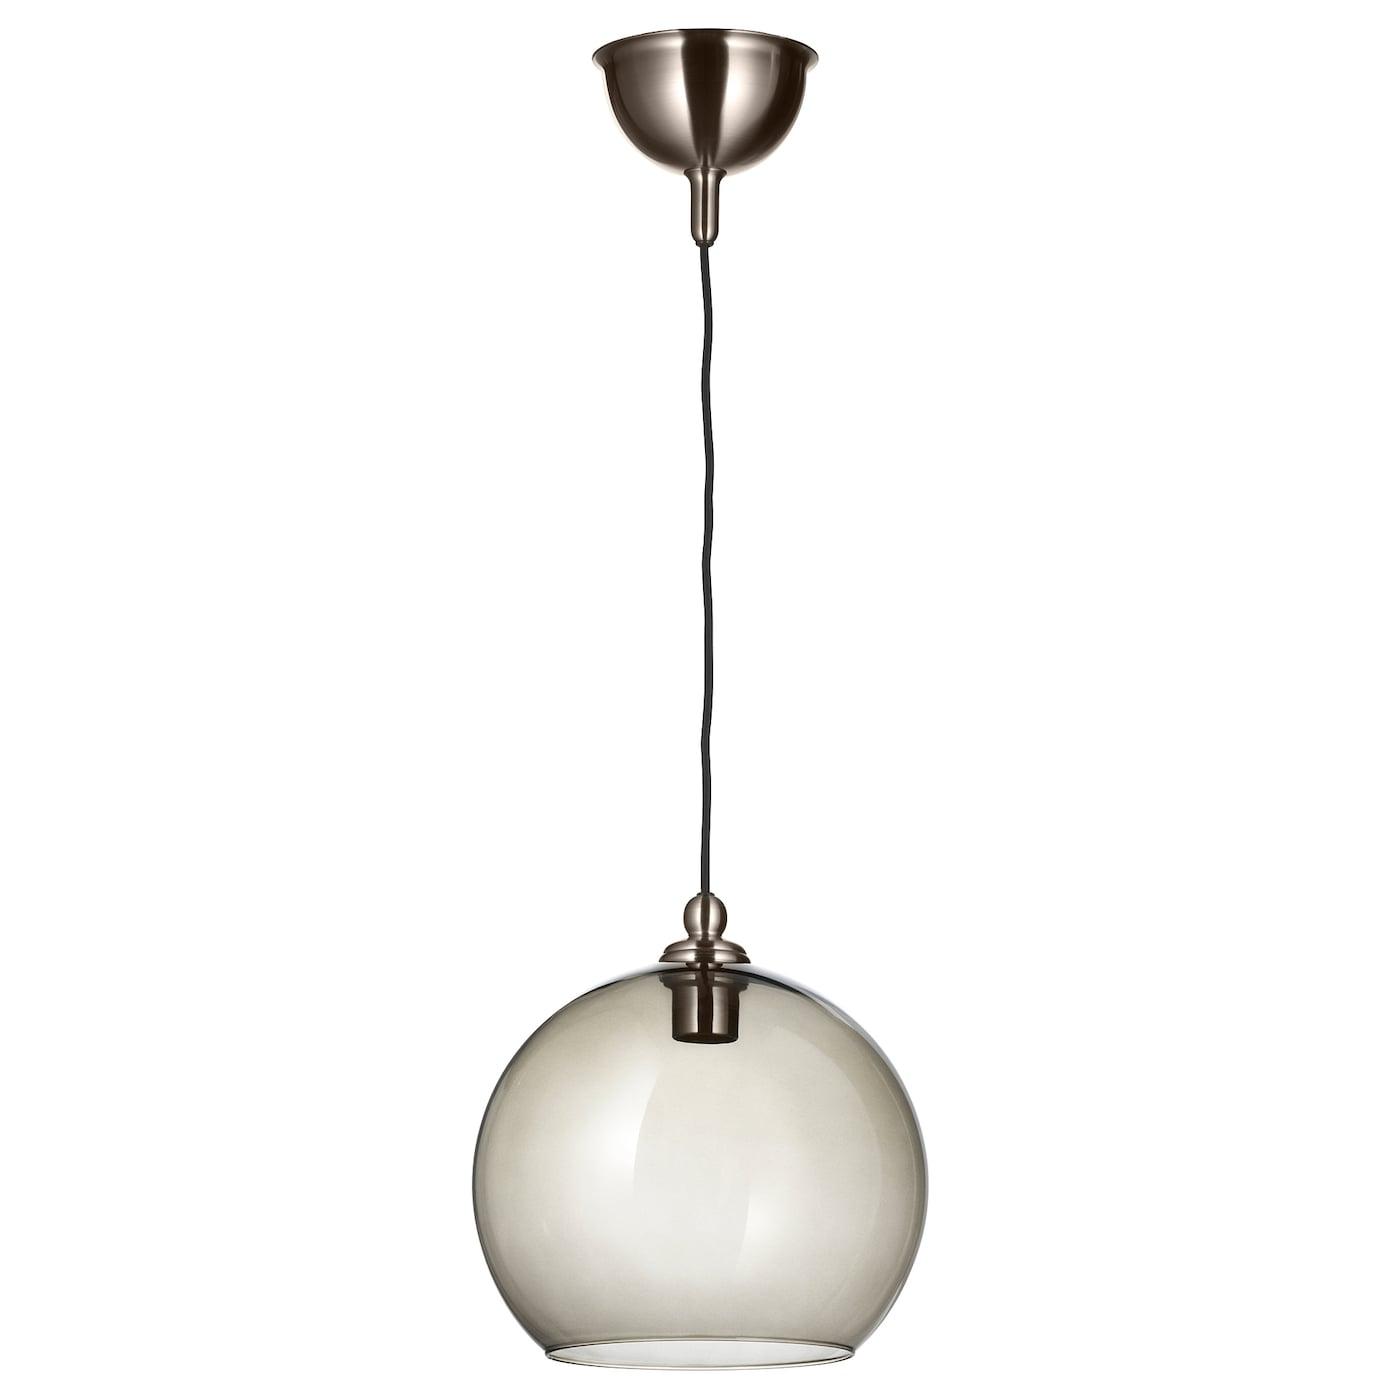 GOTHEM JAKOBSBYN Loftlampe mørkegrå, røgfarvet 30 cm